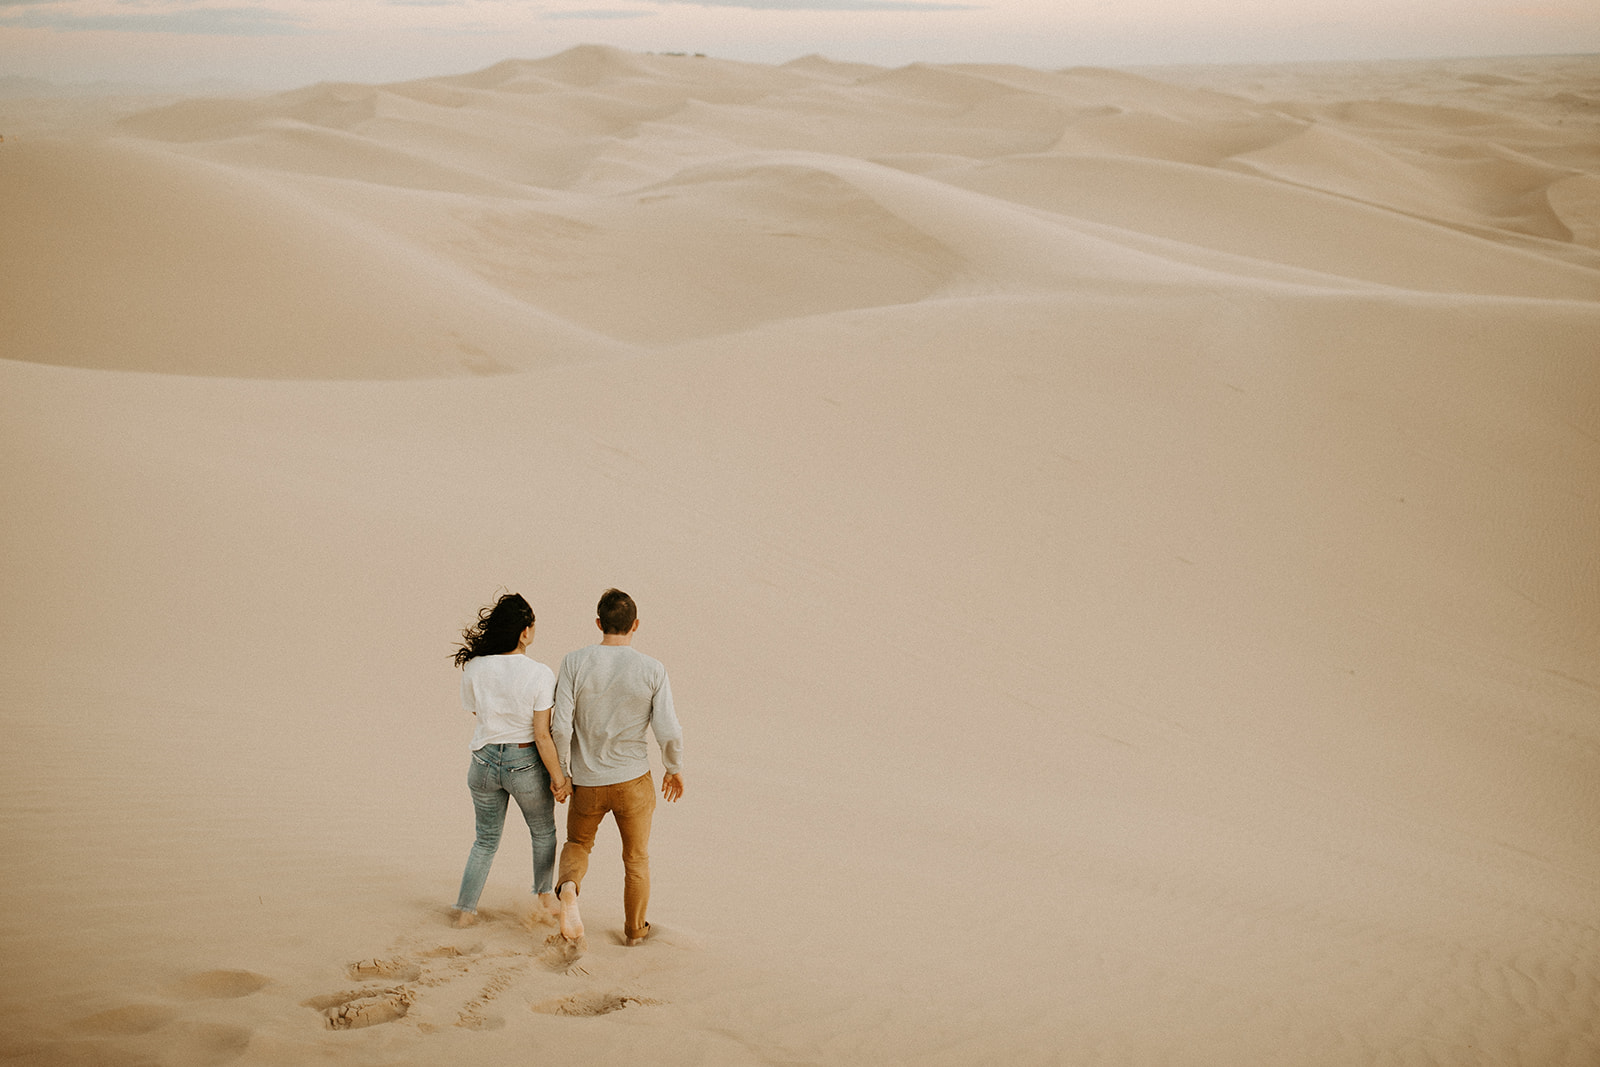 Imperial_Sand_Dunes_Linda_and_Sam_Dawn_Charles_Photographer-279.jpg